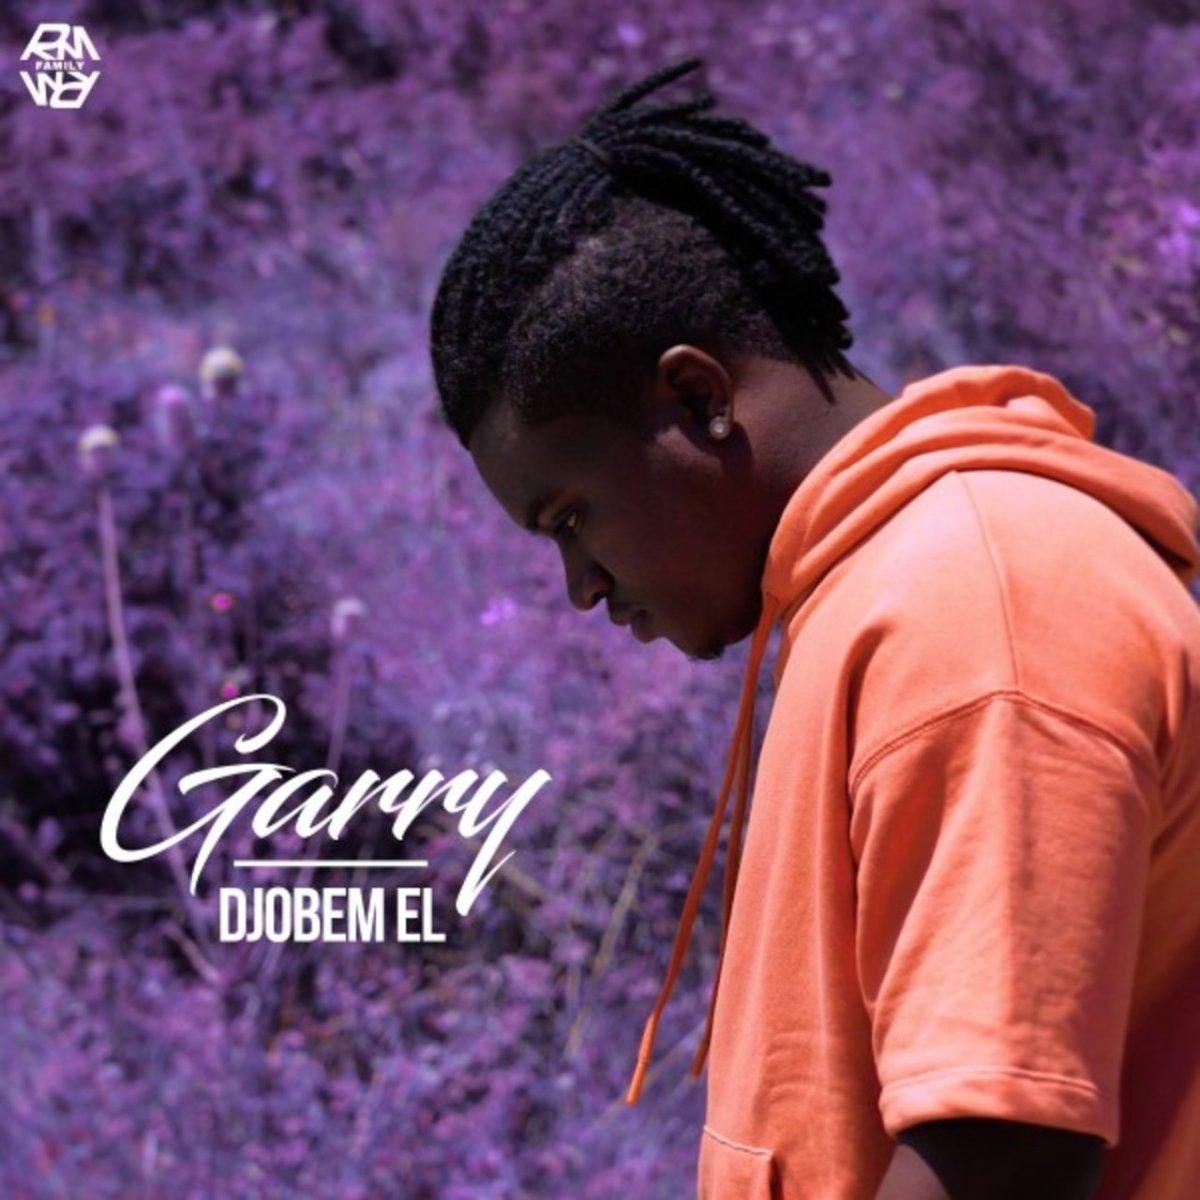 Garry - Djobem El (Cover)